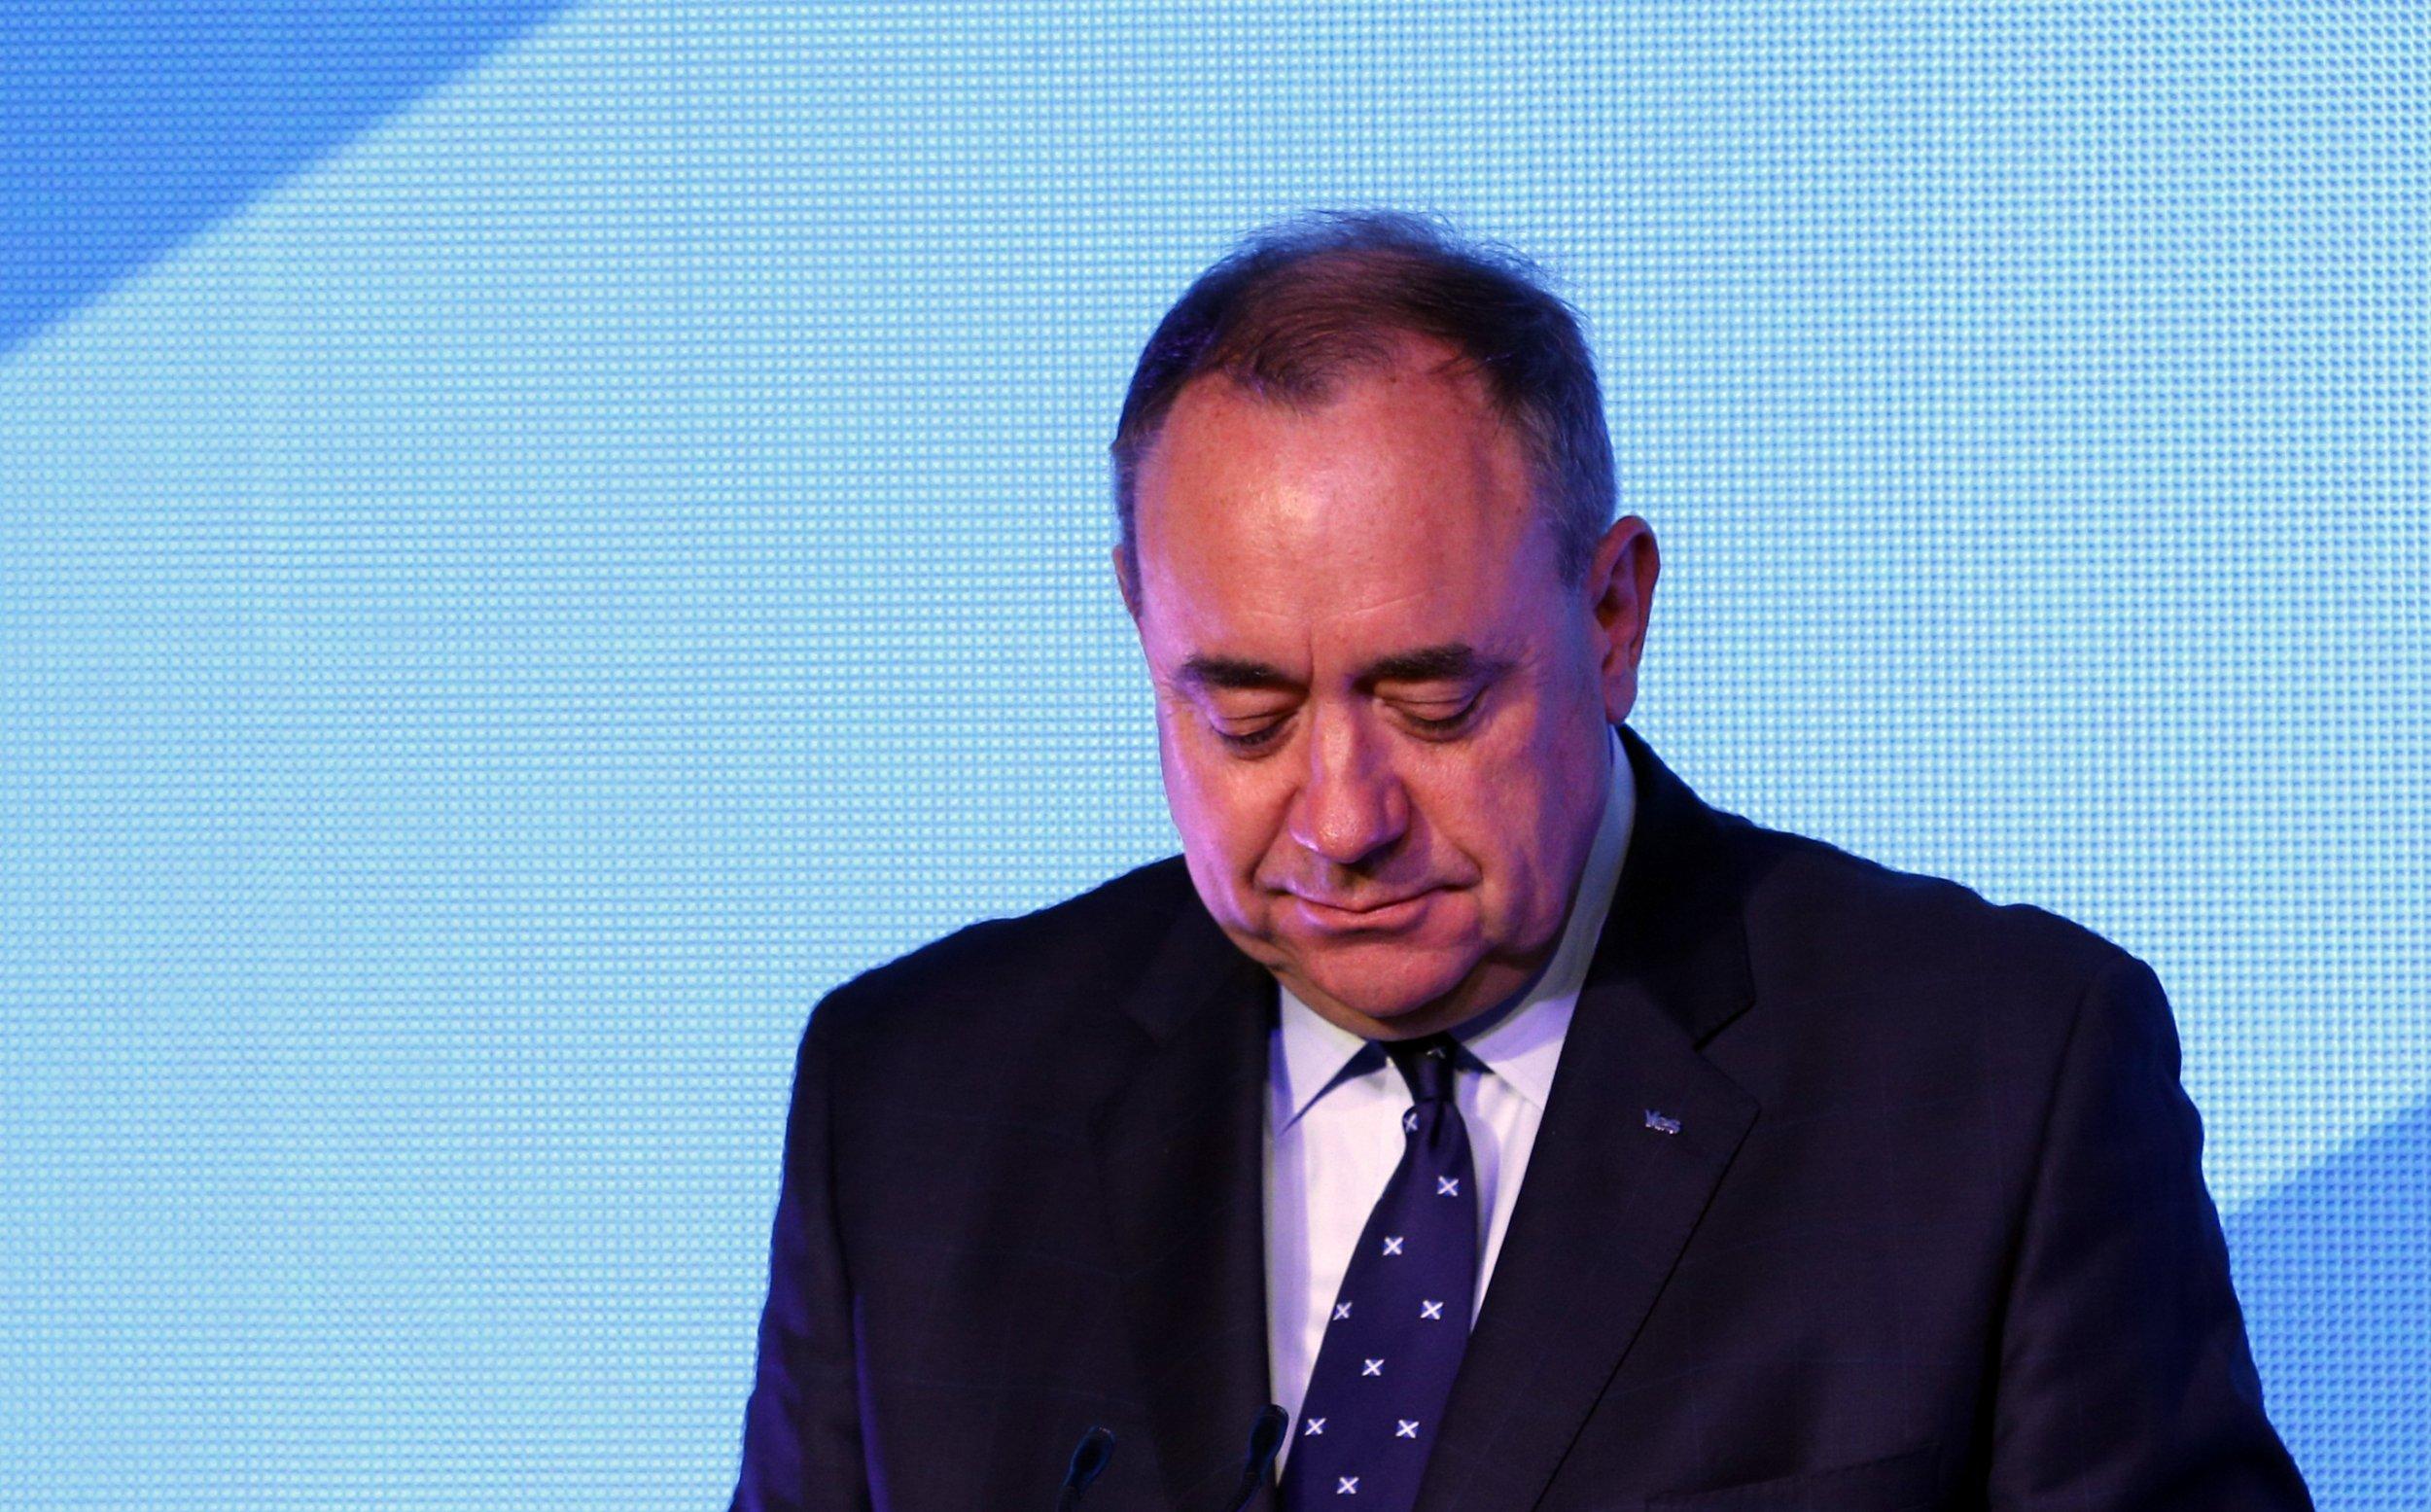 Scotland's First Minister Alec Salmond